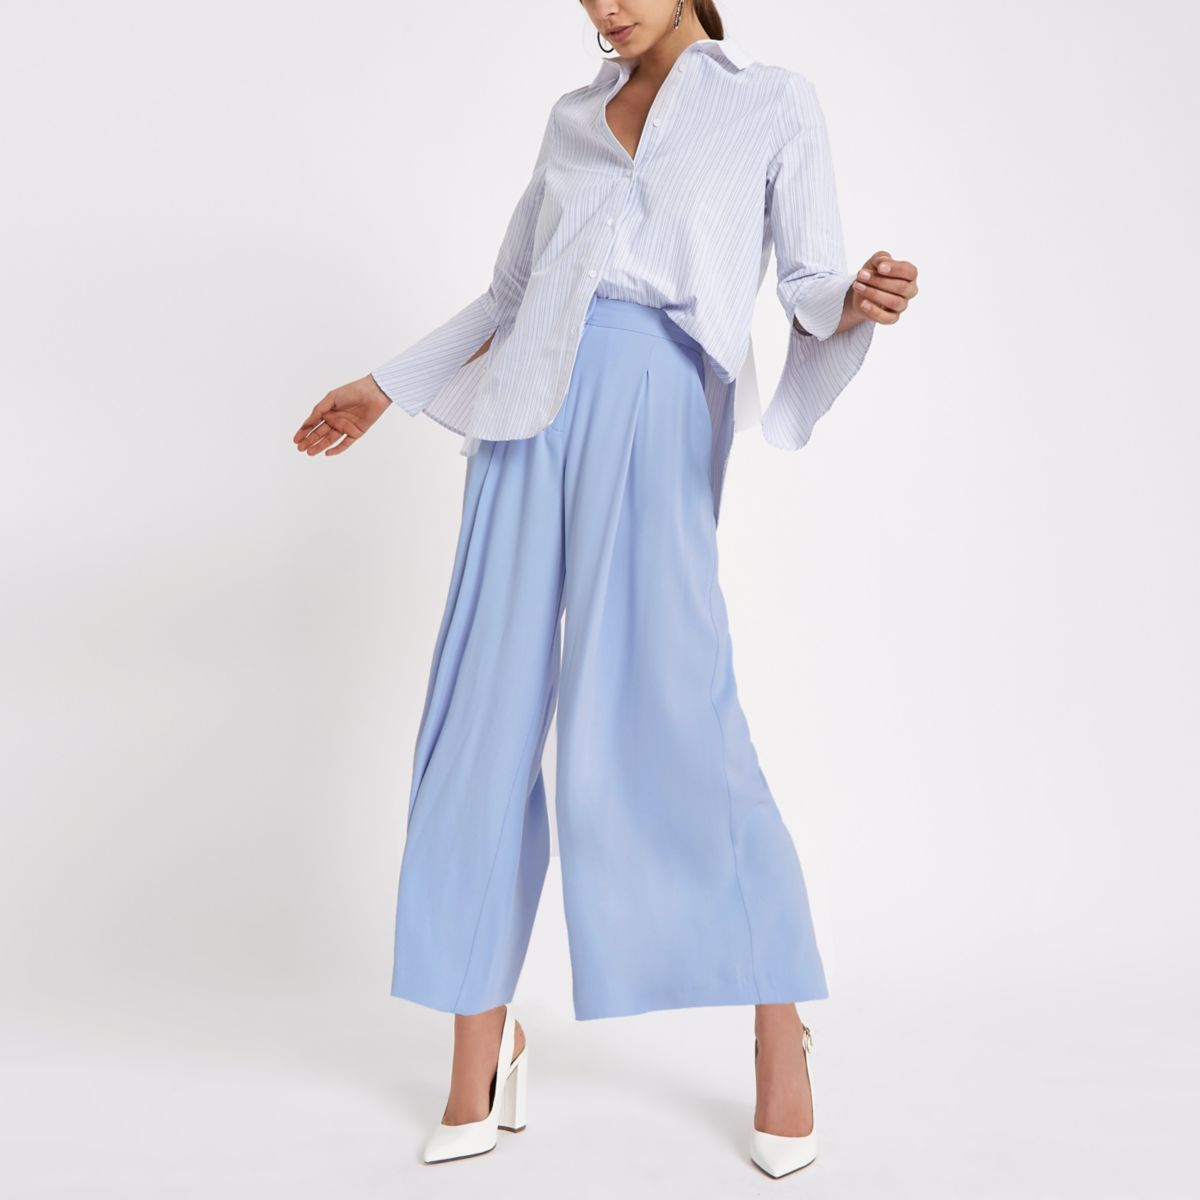 Light blue culottes